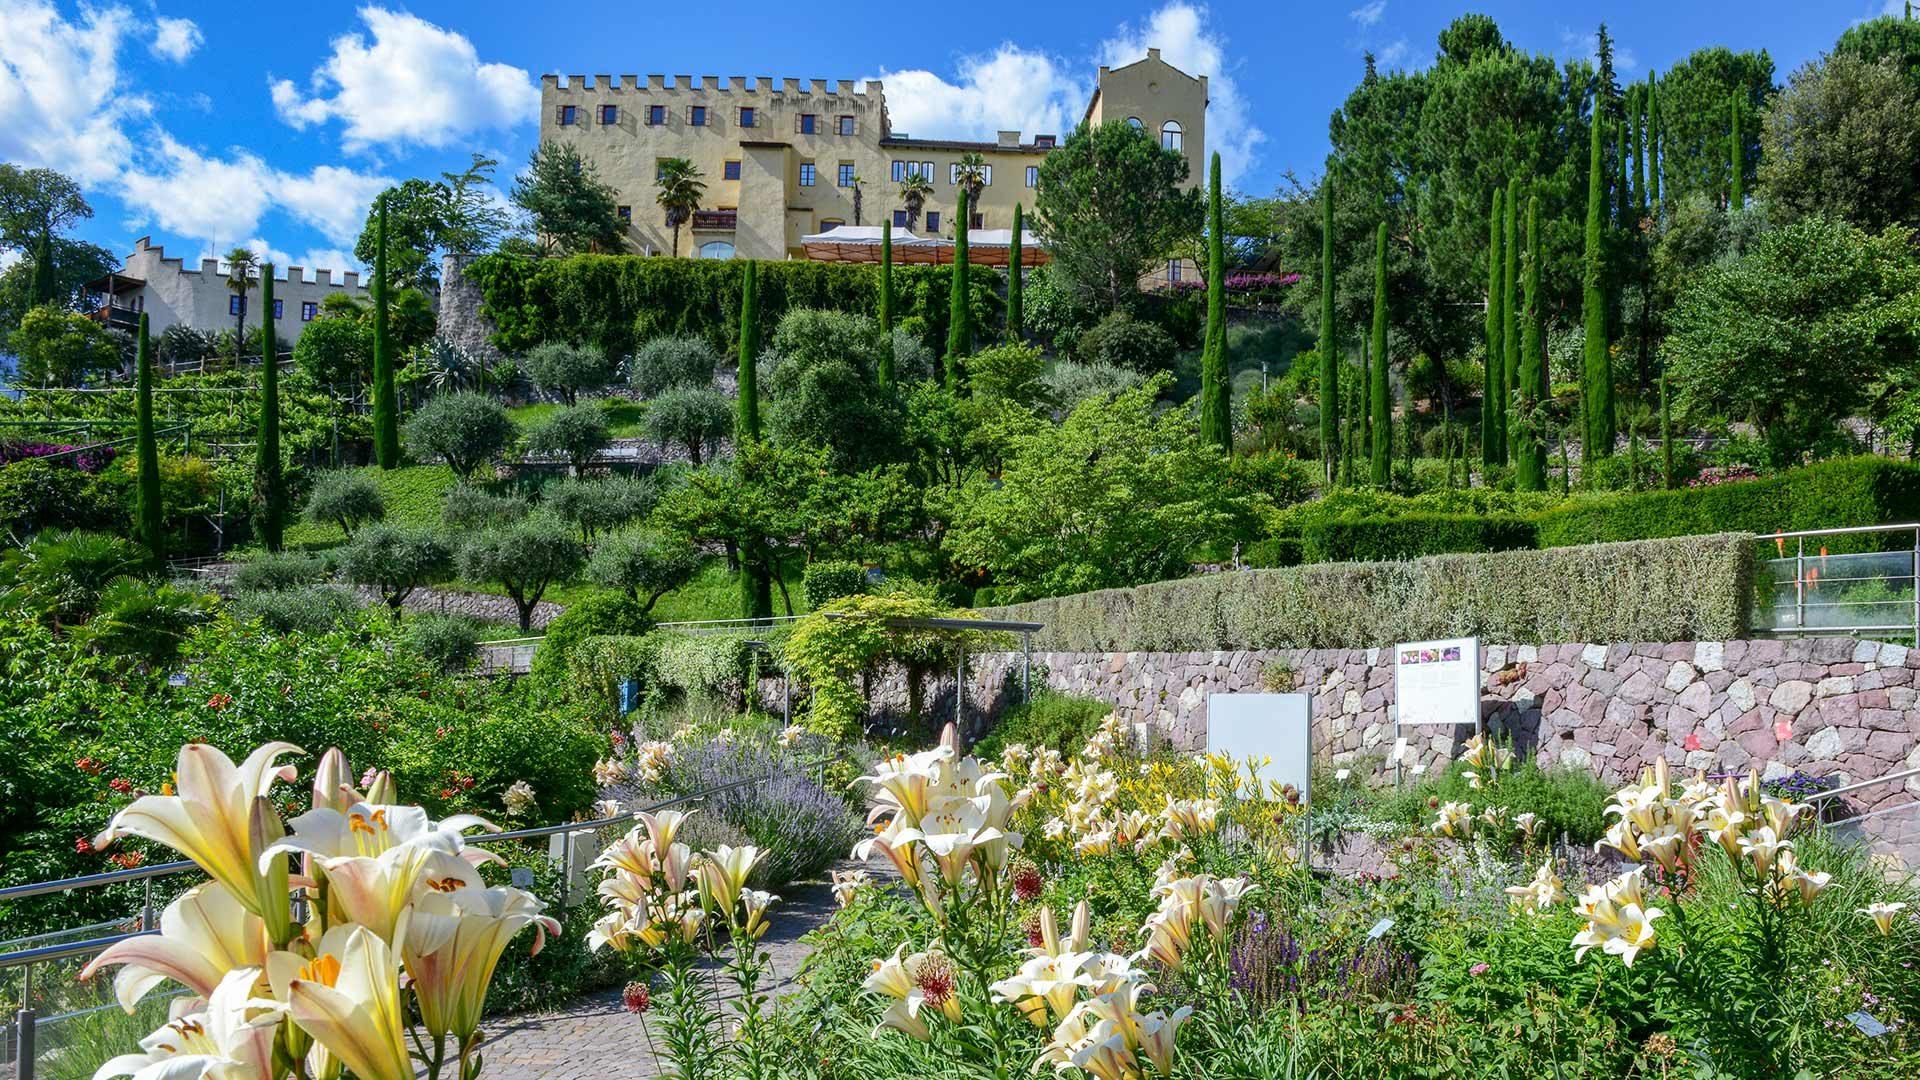 Giardini di Castel Trauttmansdorff a primavera